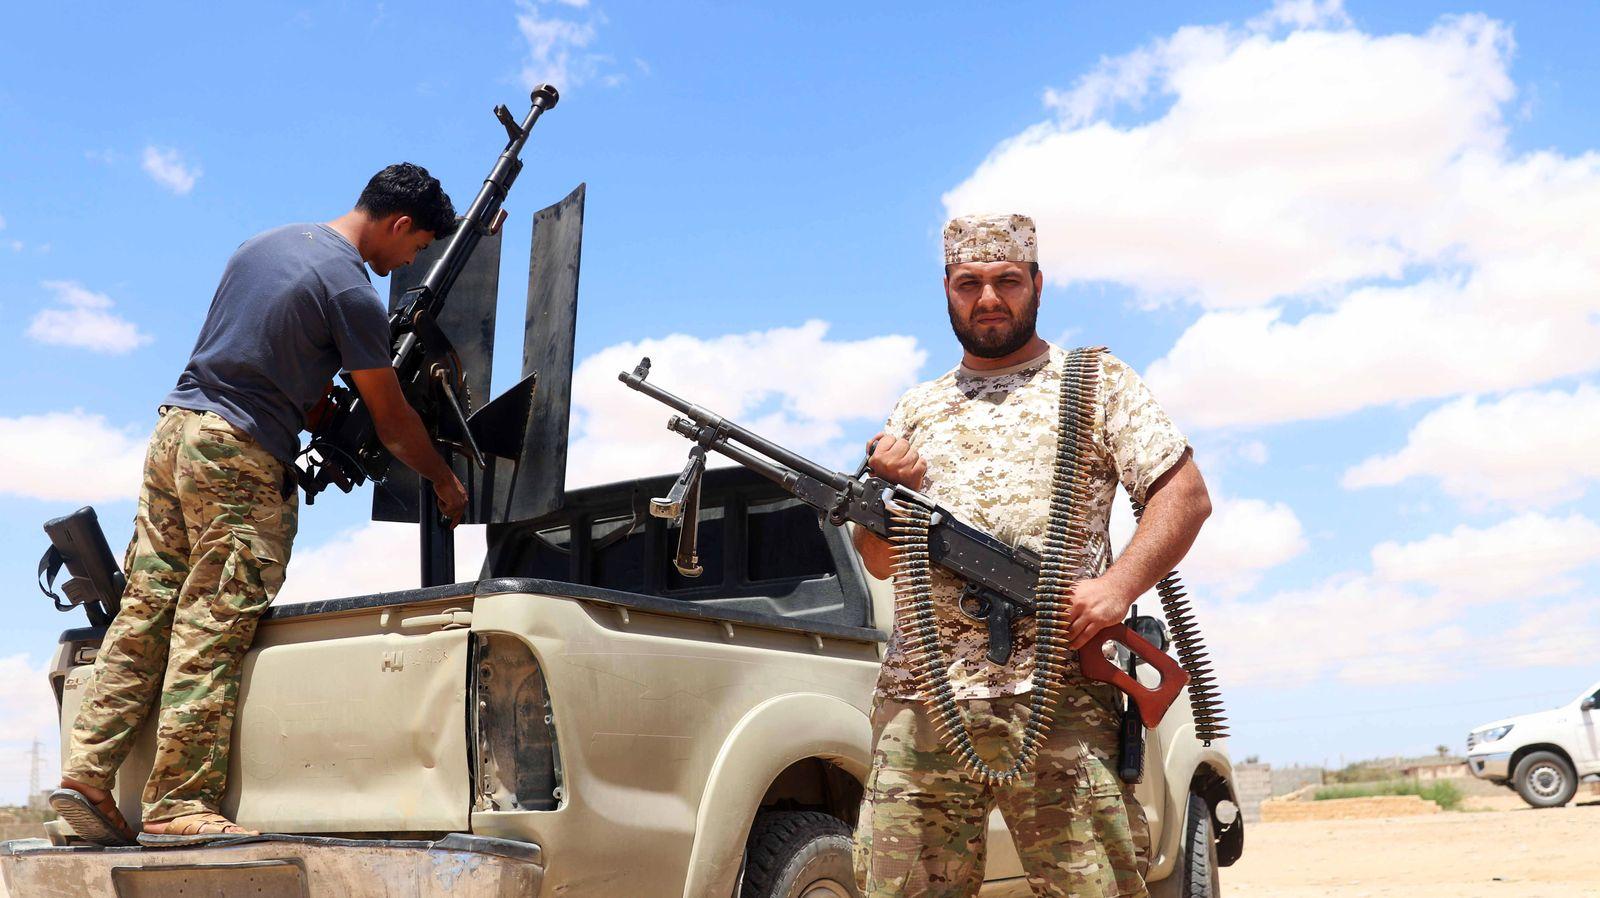 Conflict in Libya, Abu Qurain, Libyan Arab Jamahiriya - 20 Jul 2020